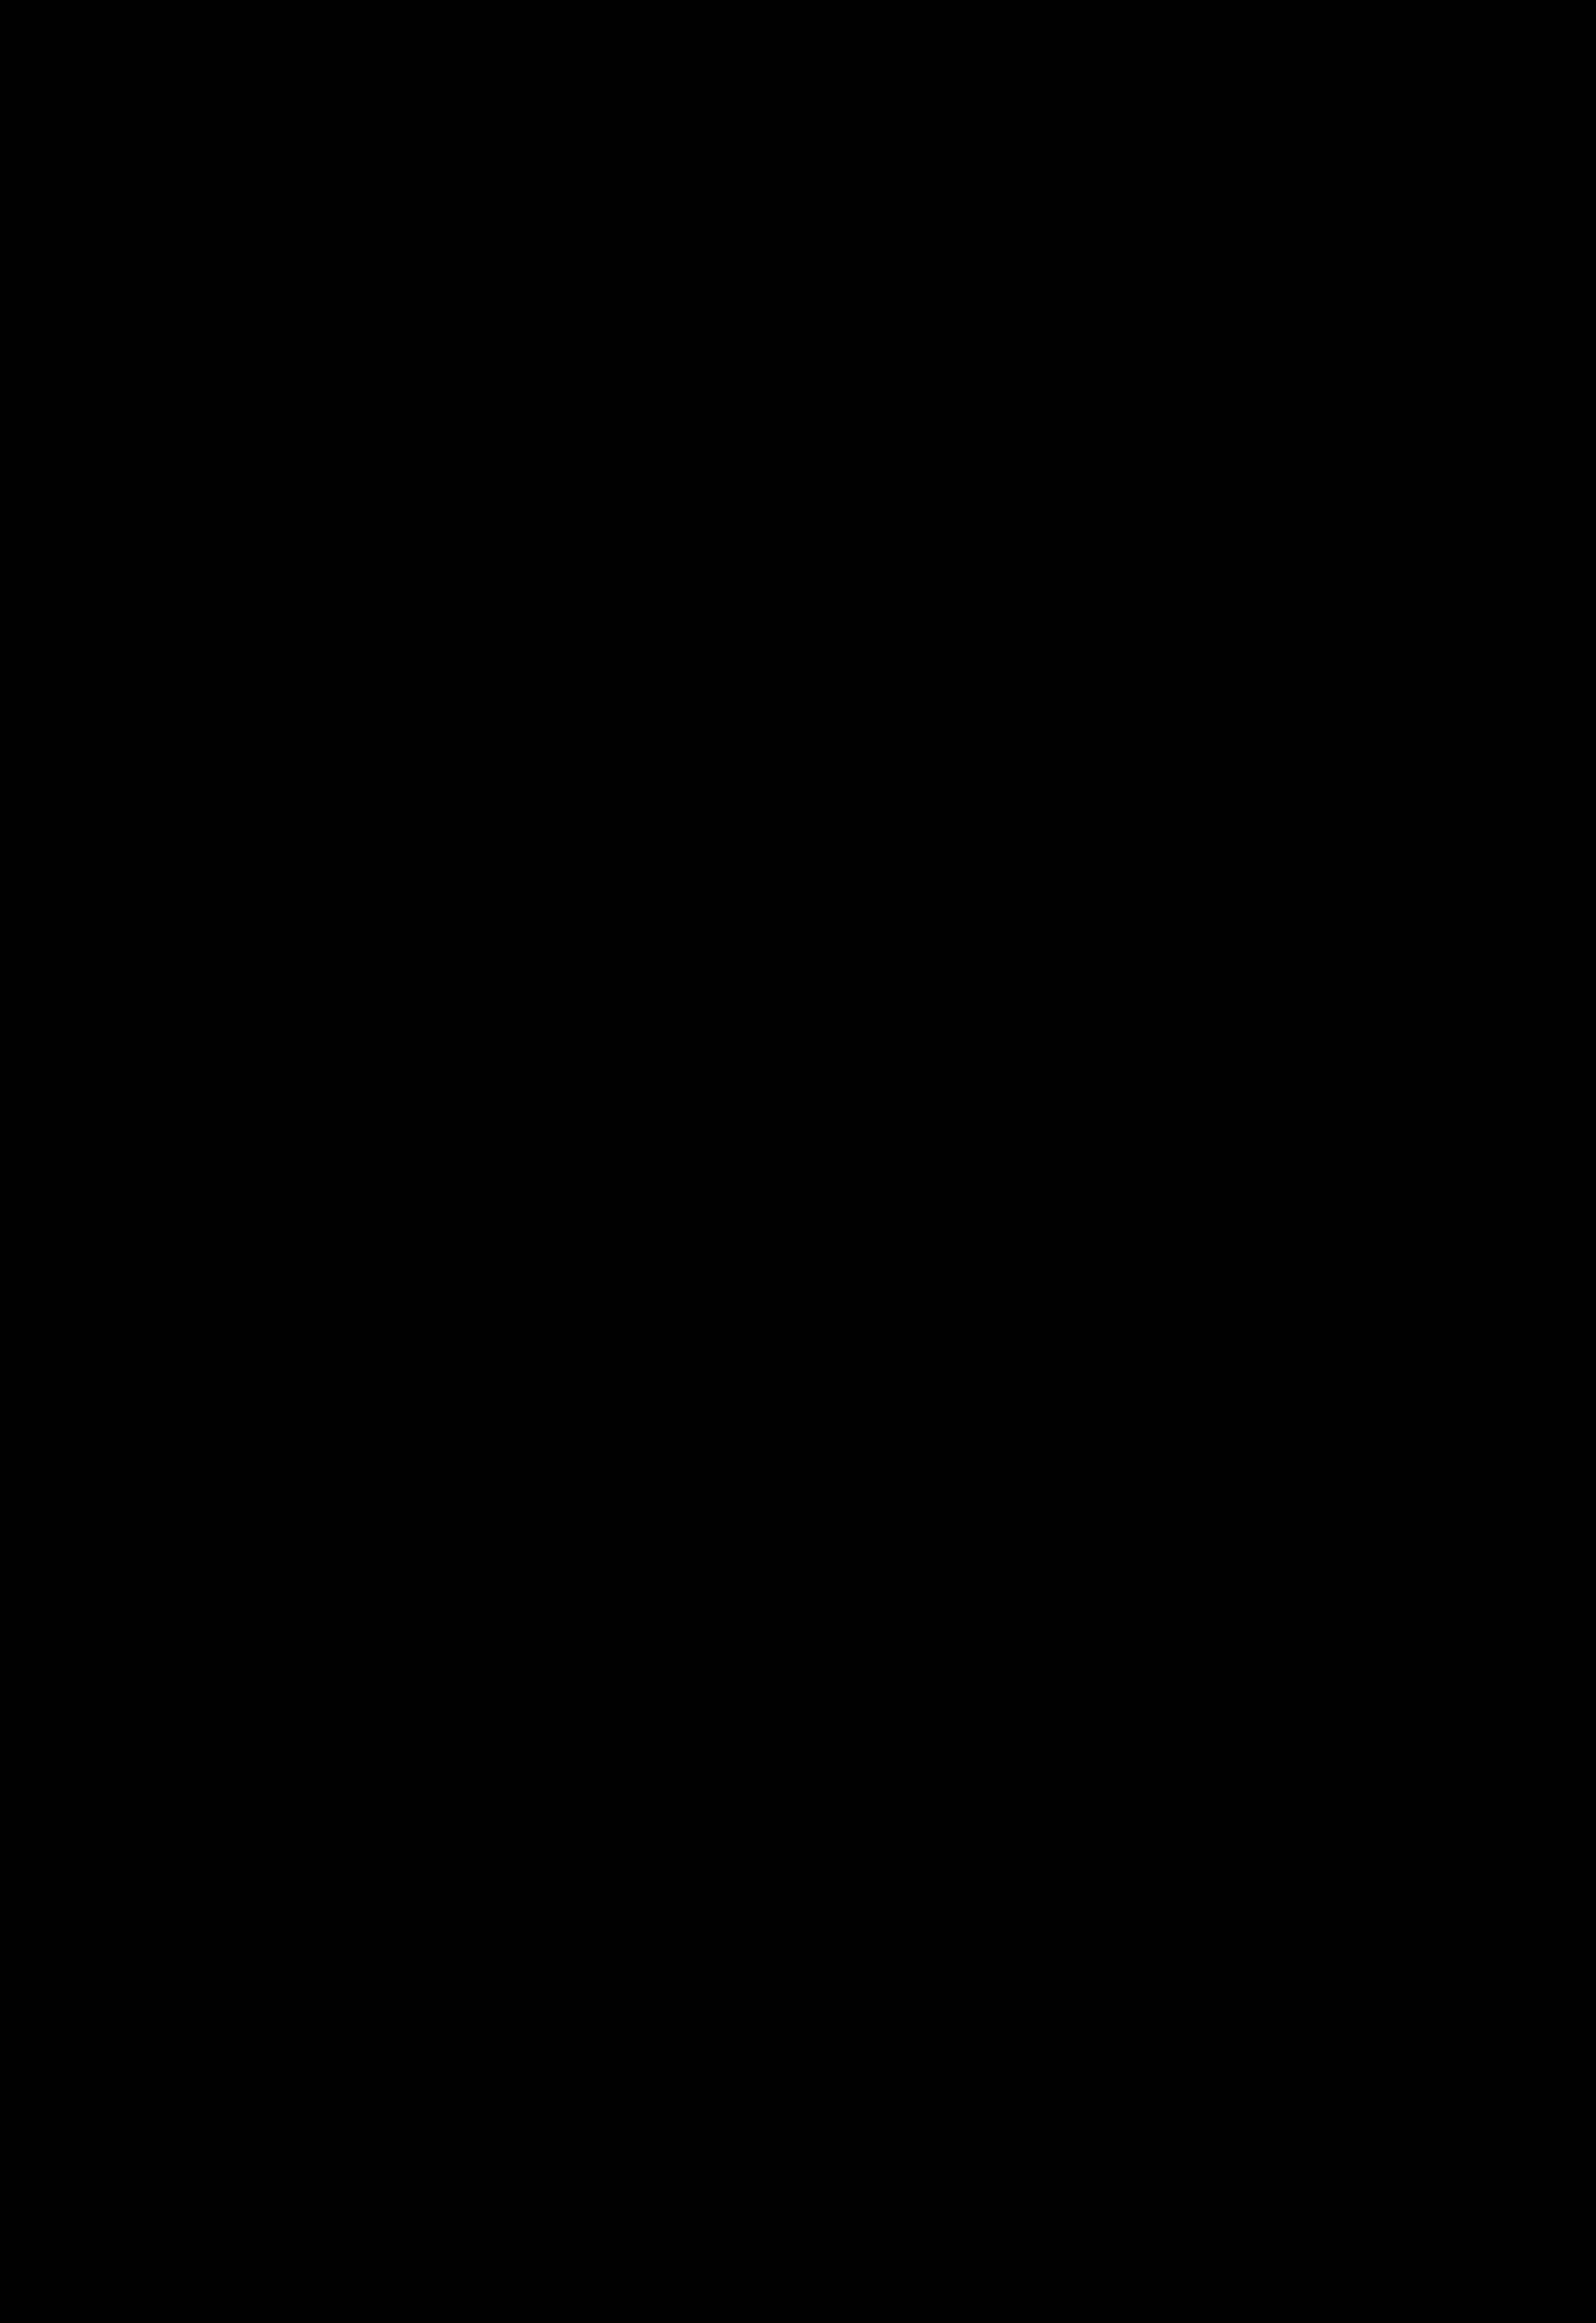 Falling big image png. Devil clipart logo